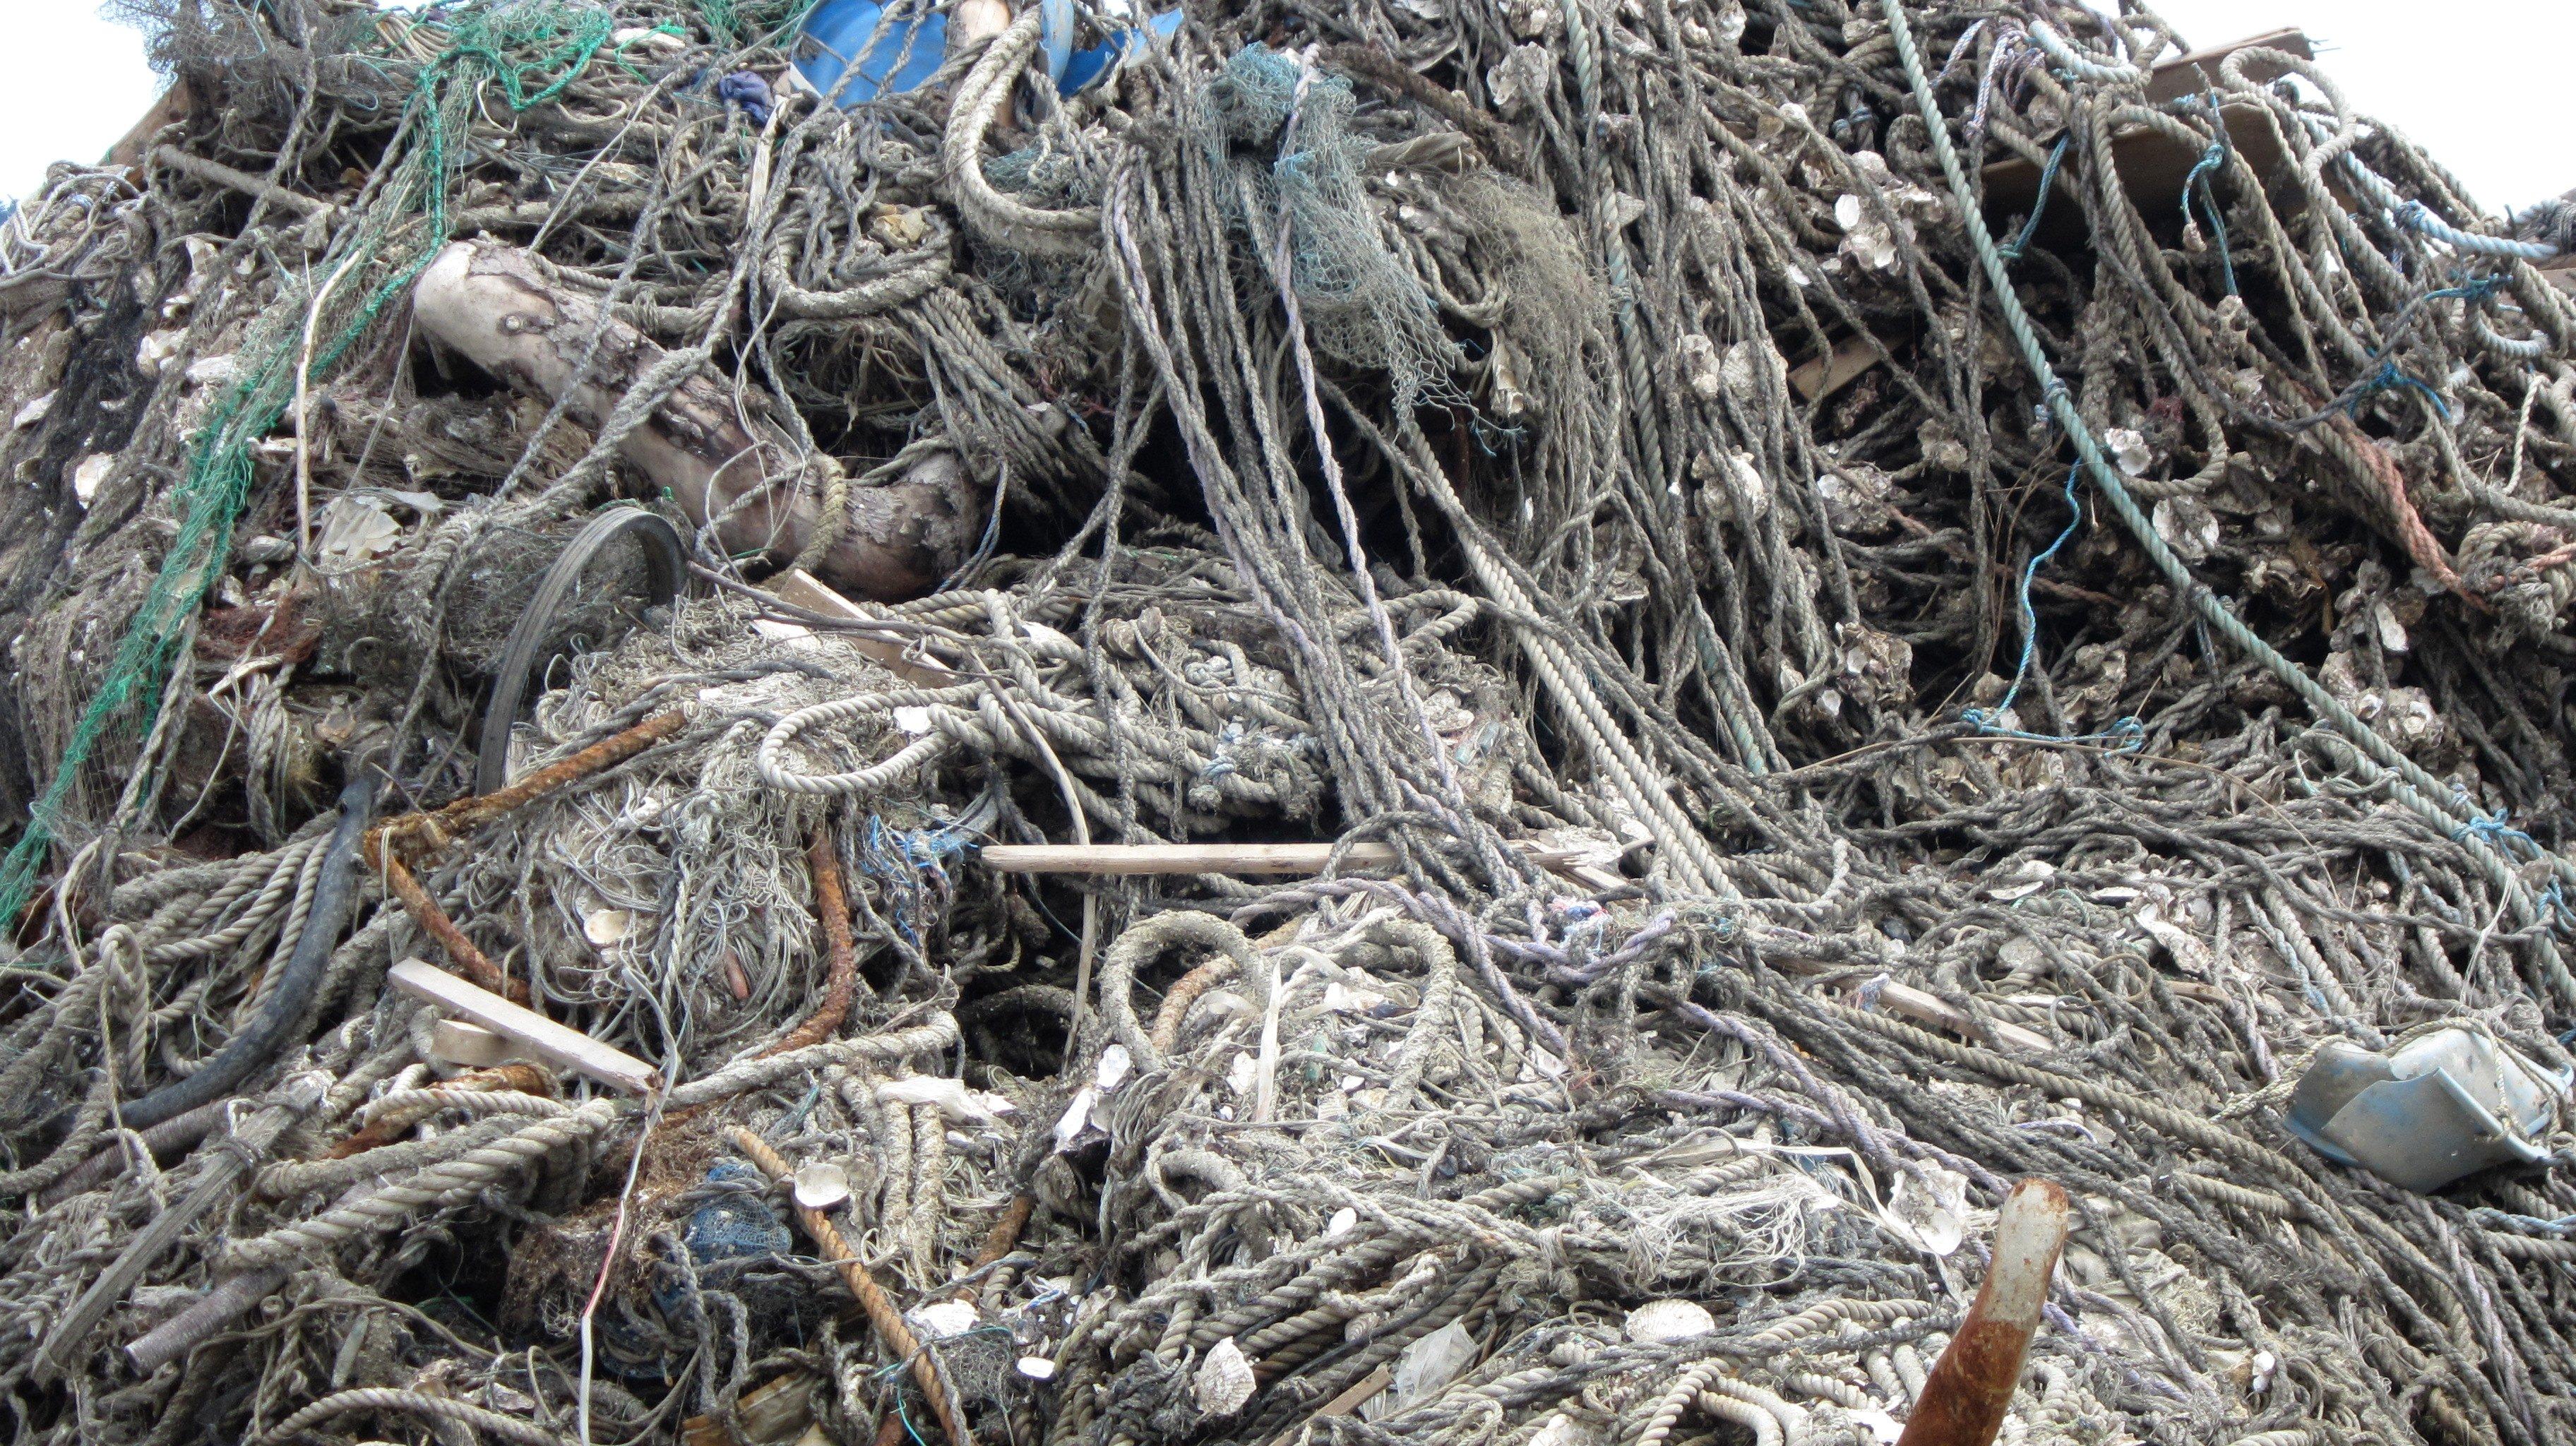 Japan, Ishinomaki, Koamikura-hama, Koamikurahama, ropes, mountains, tsunami, debris, 3.11, 2011, March 11, clean-up, recovery, efforts, volunteering, piles